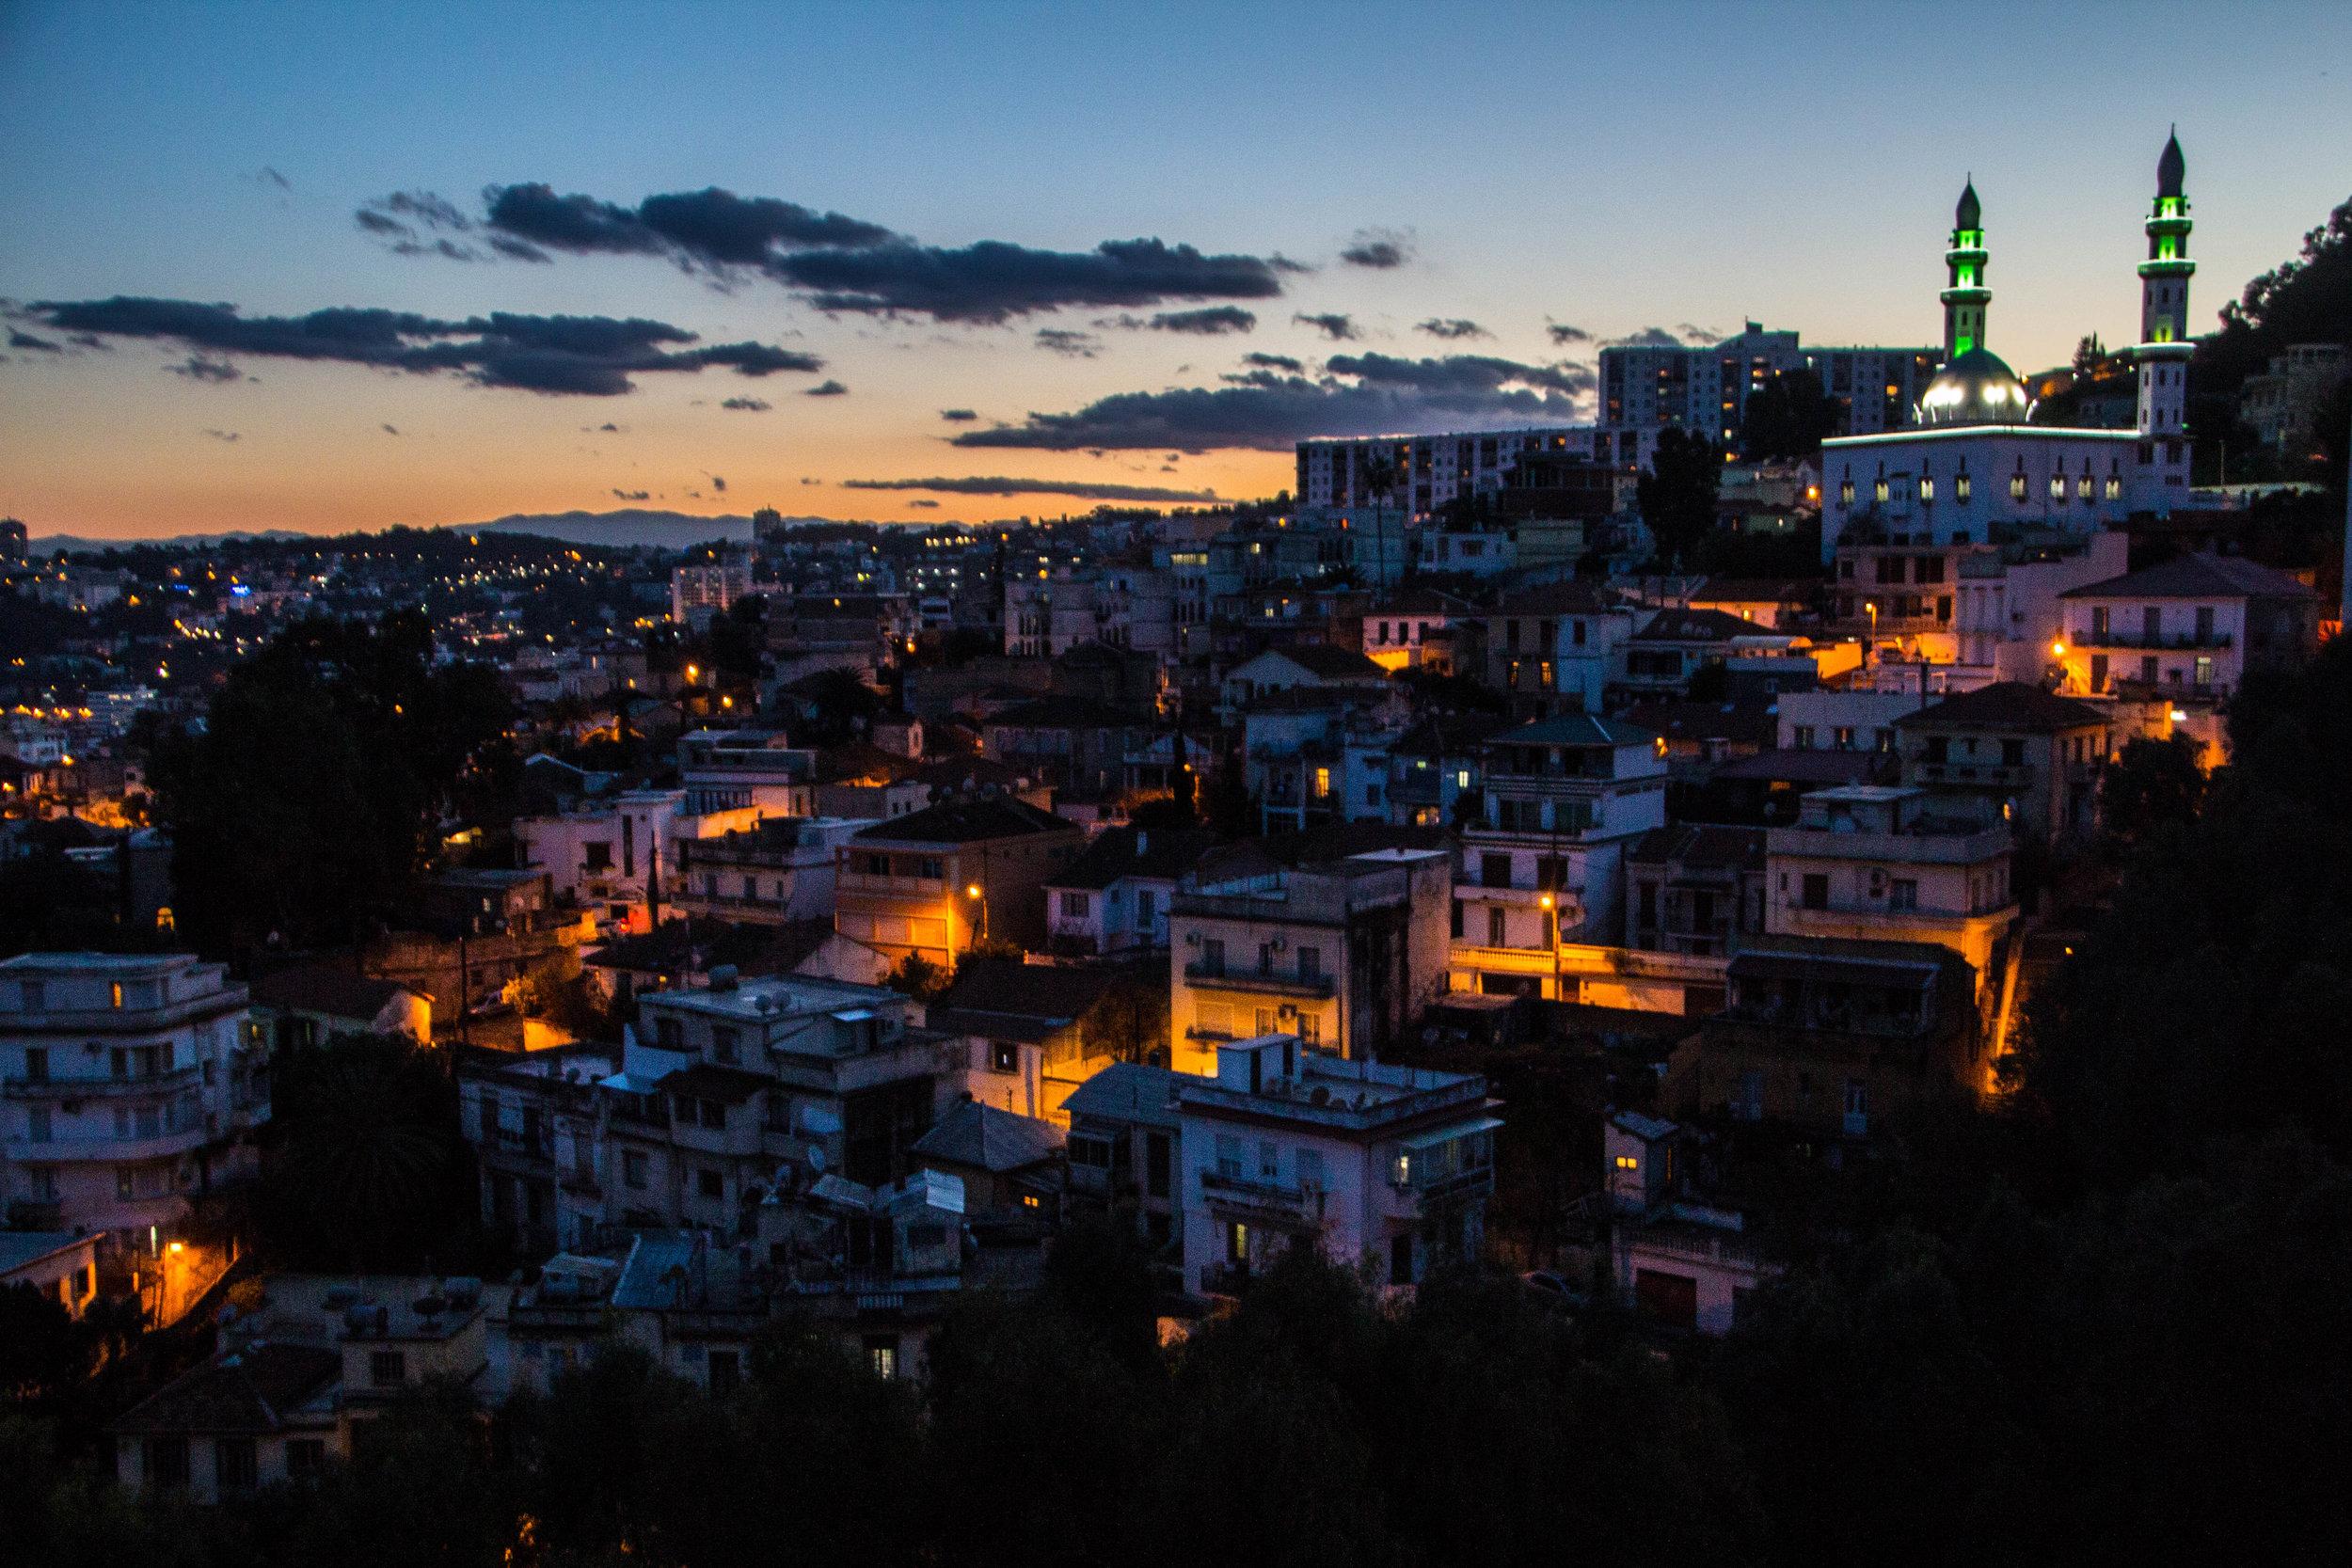 algiers-algieria-sunset-view-45.jpg